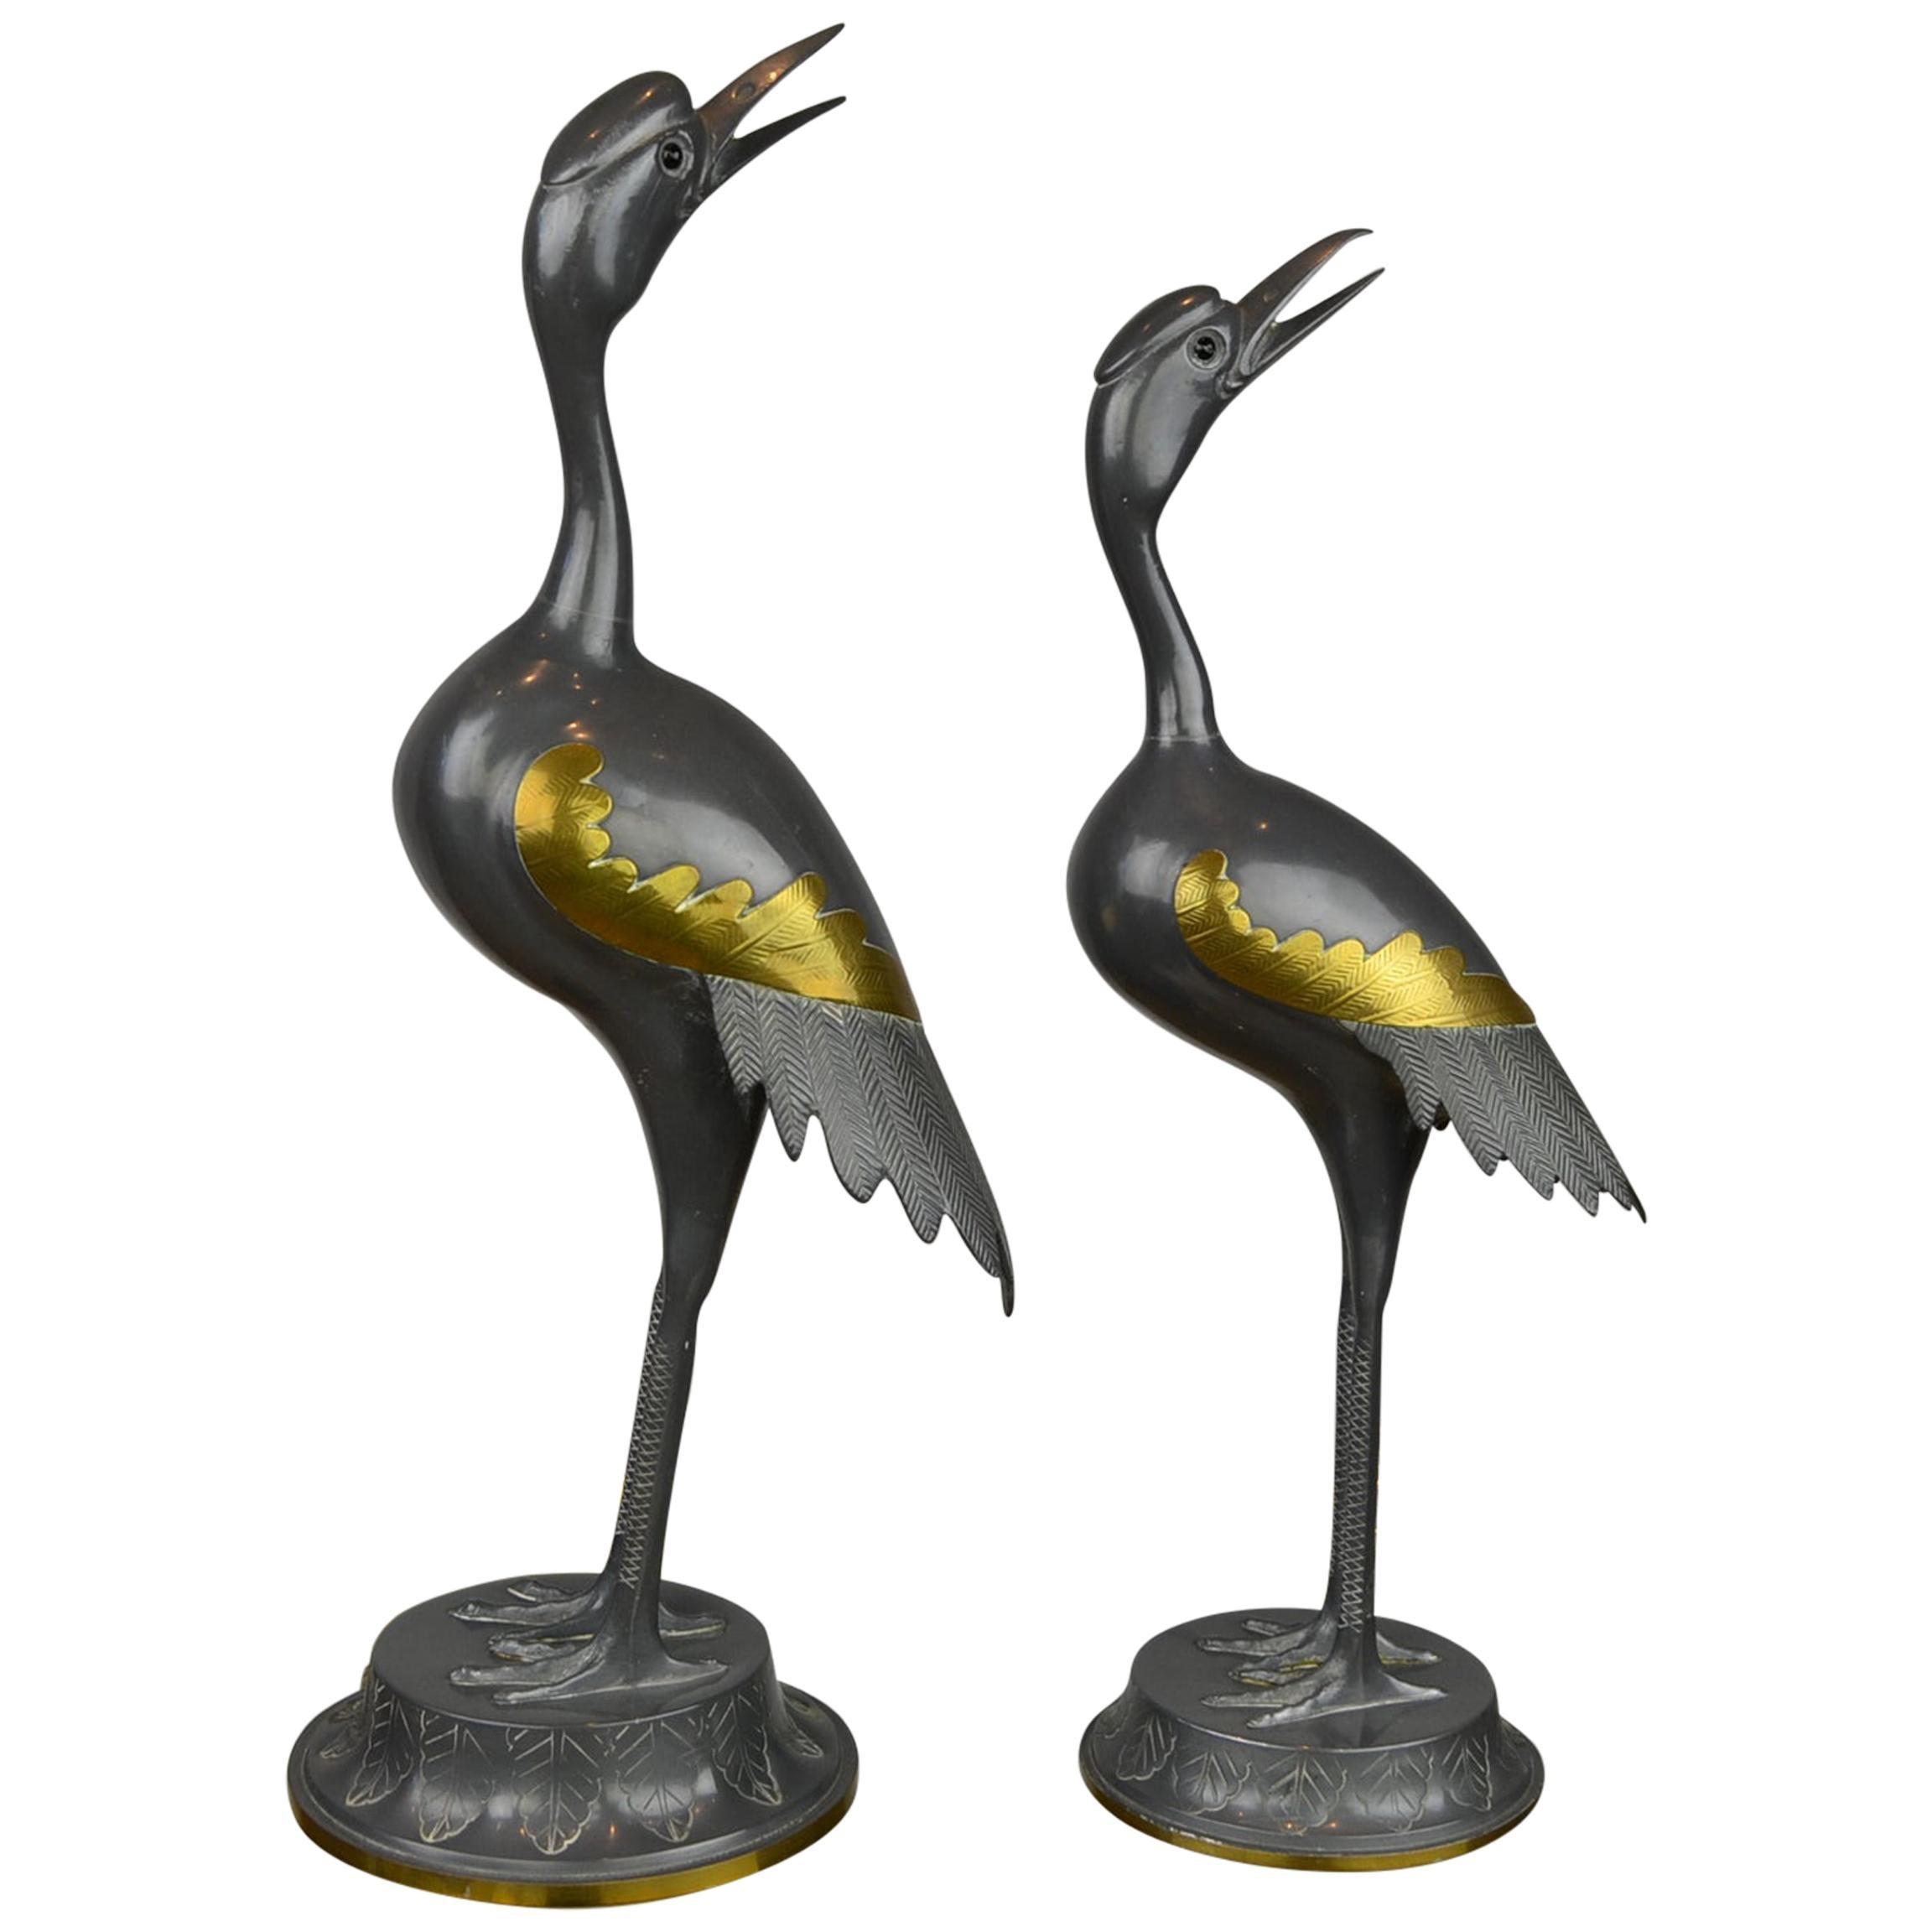 Pair of Vintage Metal with Brass Crane Bird Sculptures, 1970s, Europe